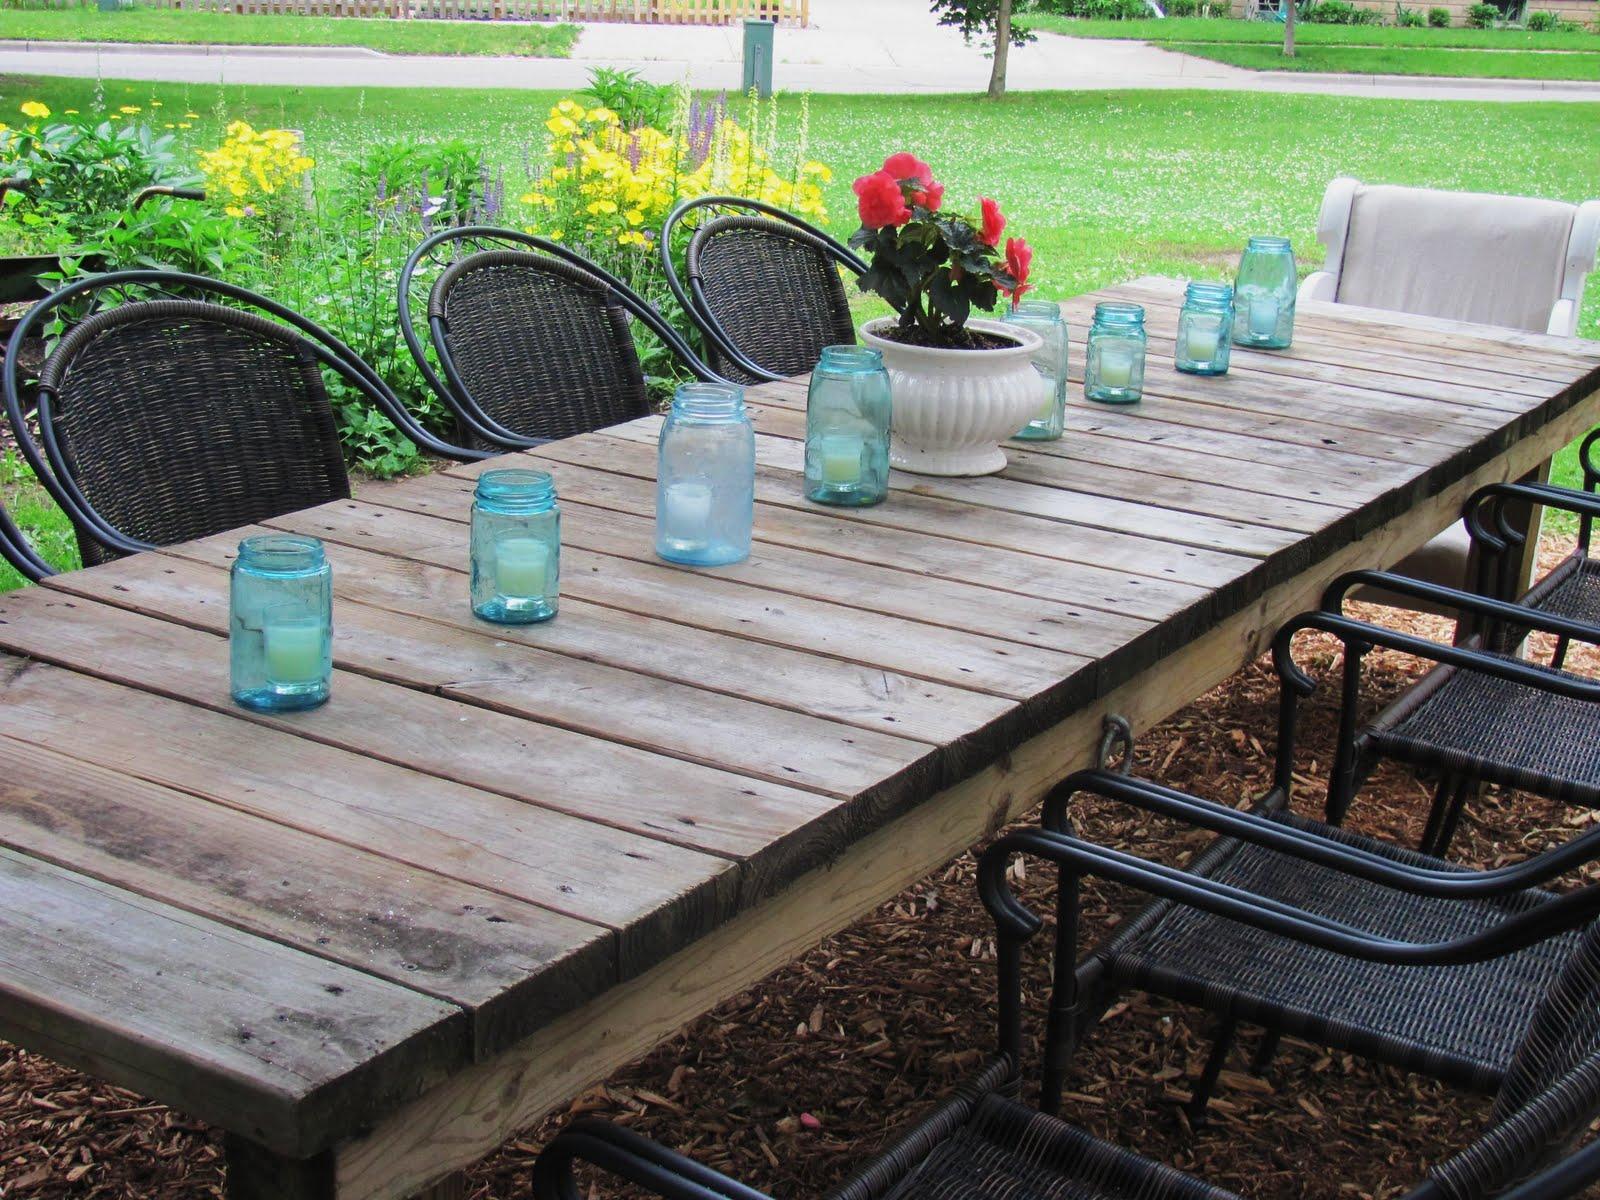 Homemade Hippiness : Backyard Party: a mesh of design ideas